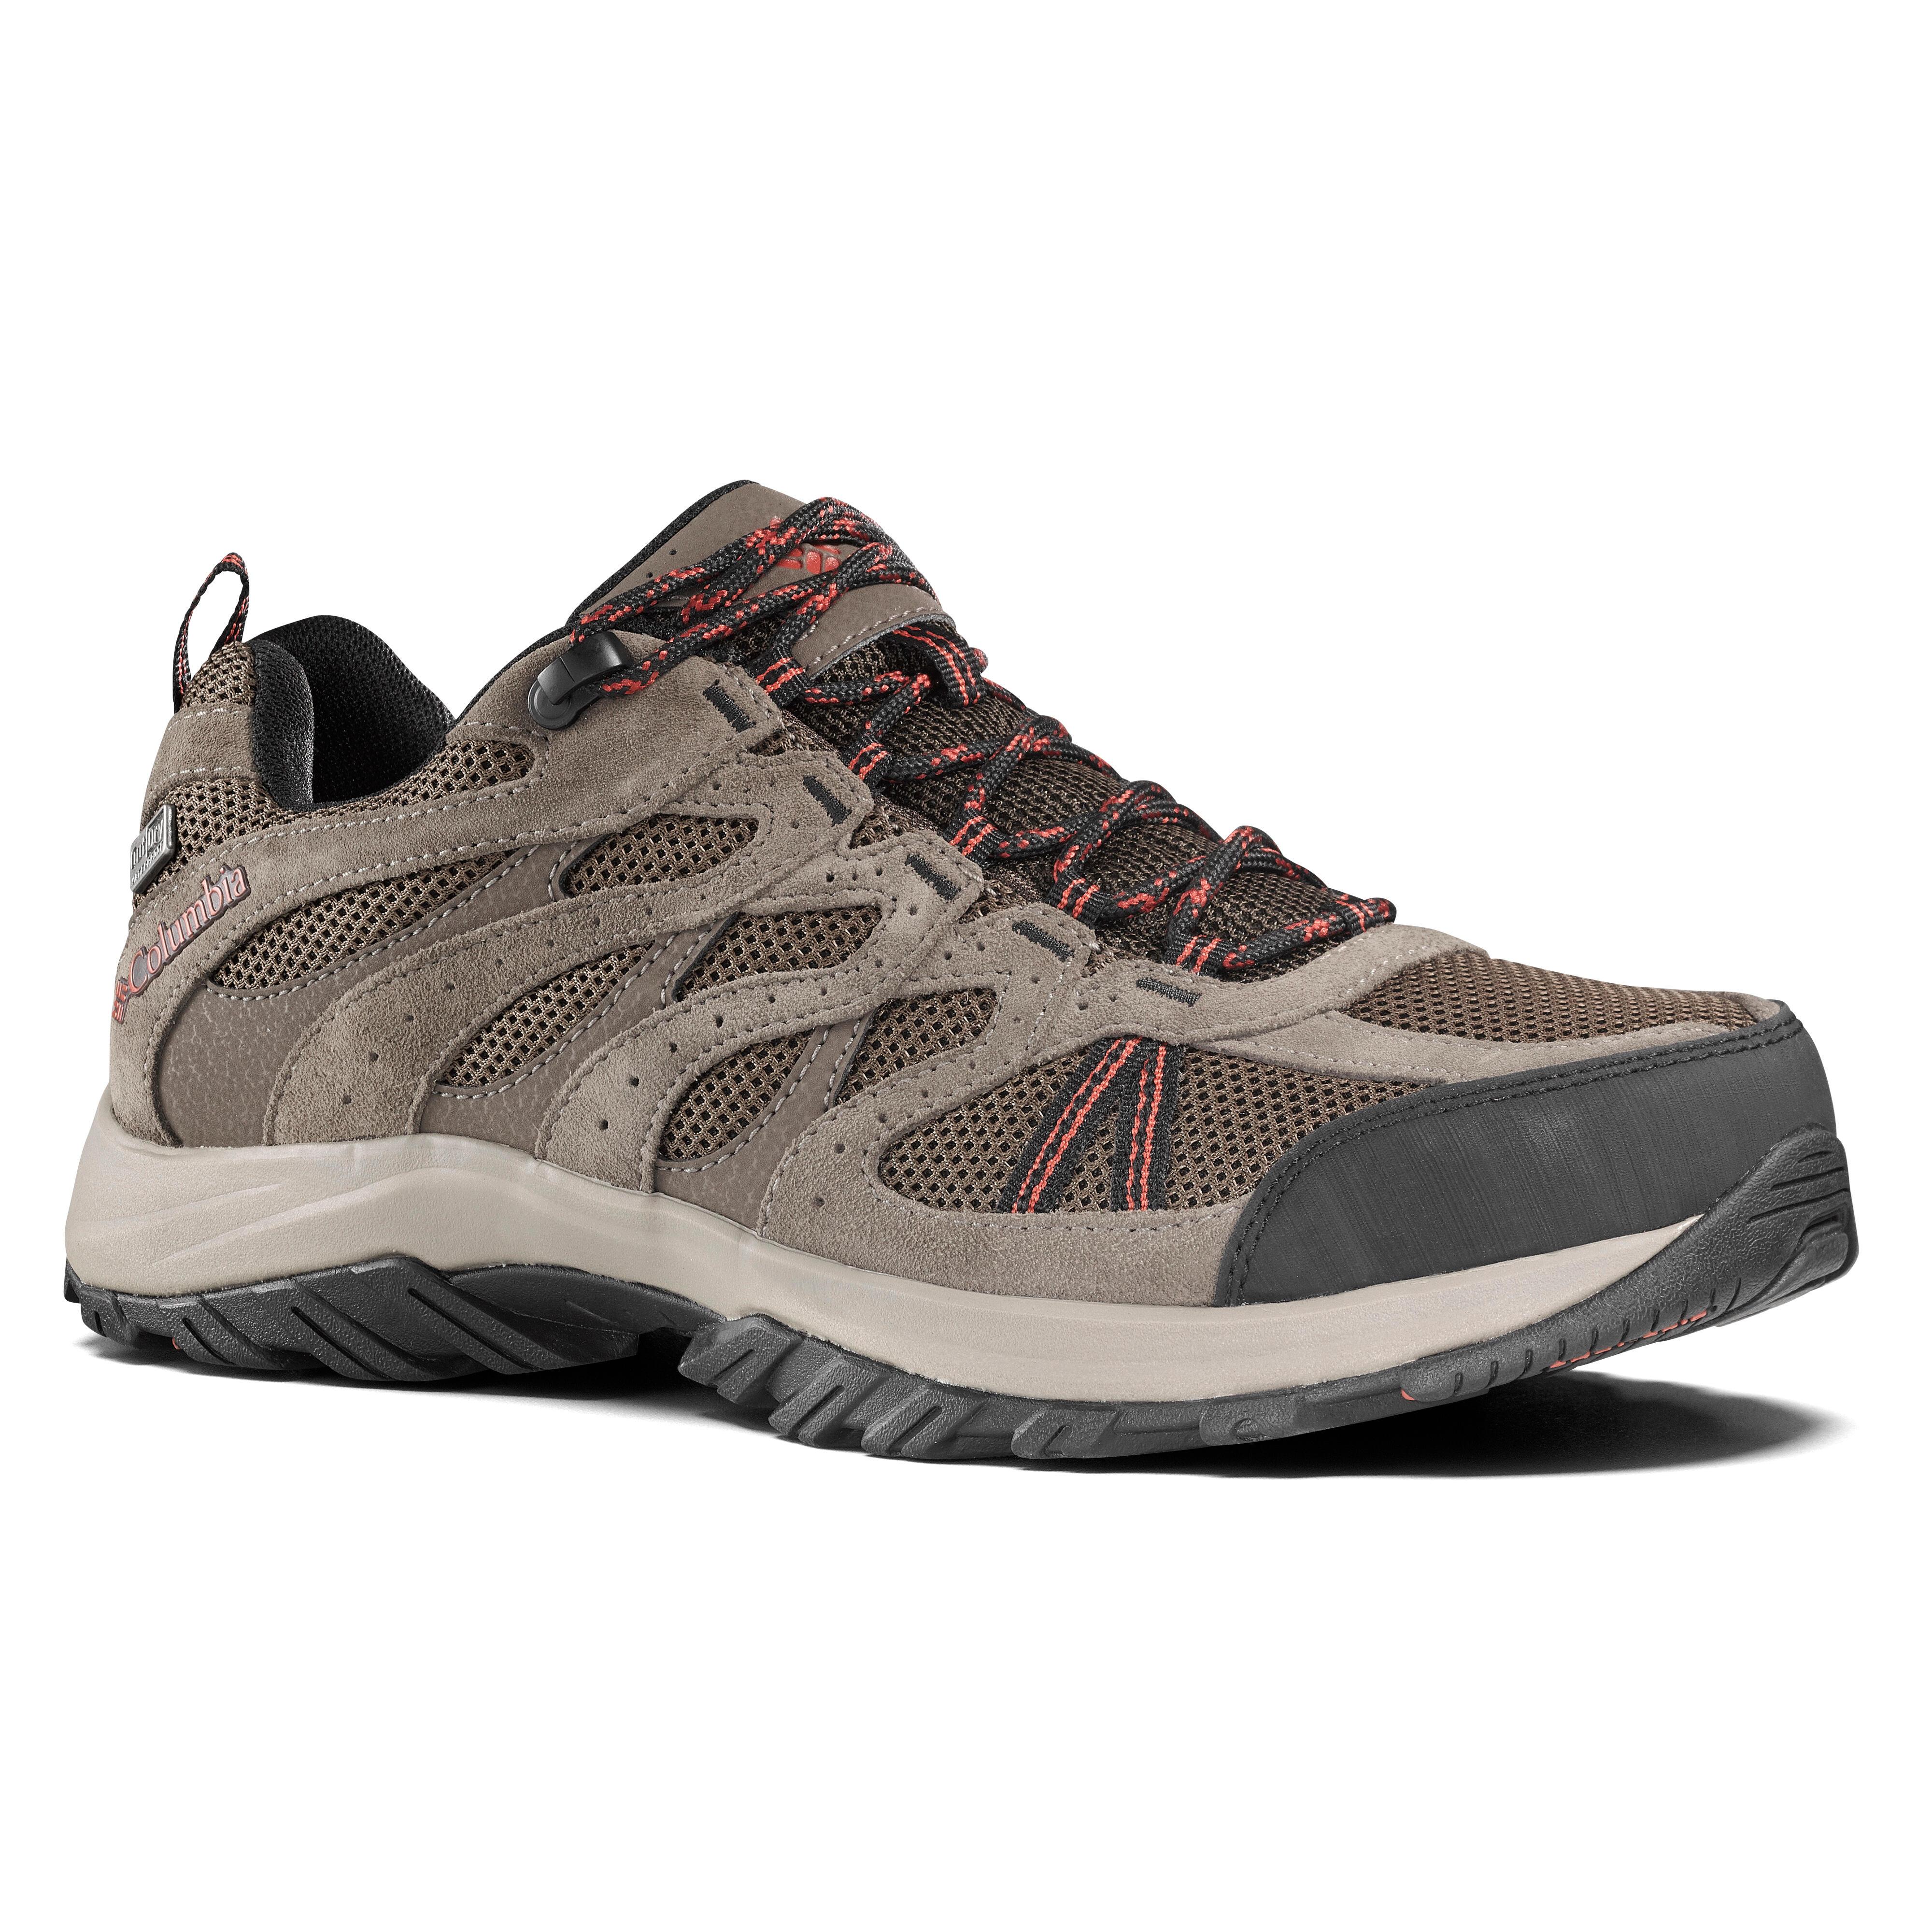 d04d38c2f3a Comprar Zapatillas y Botas Impermeables Hombre